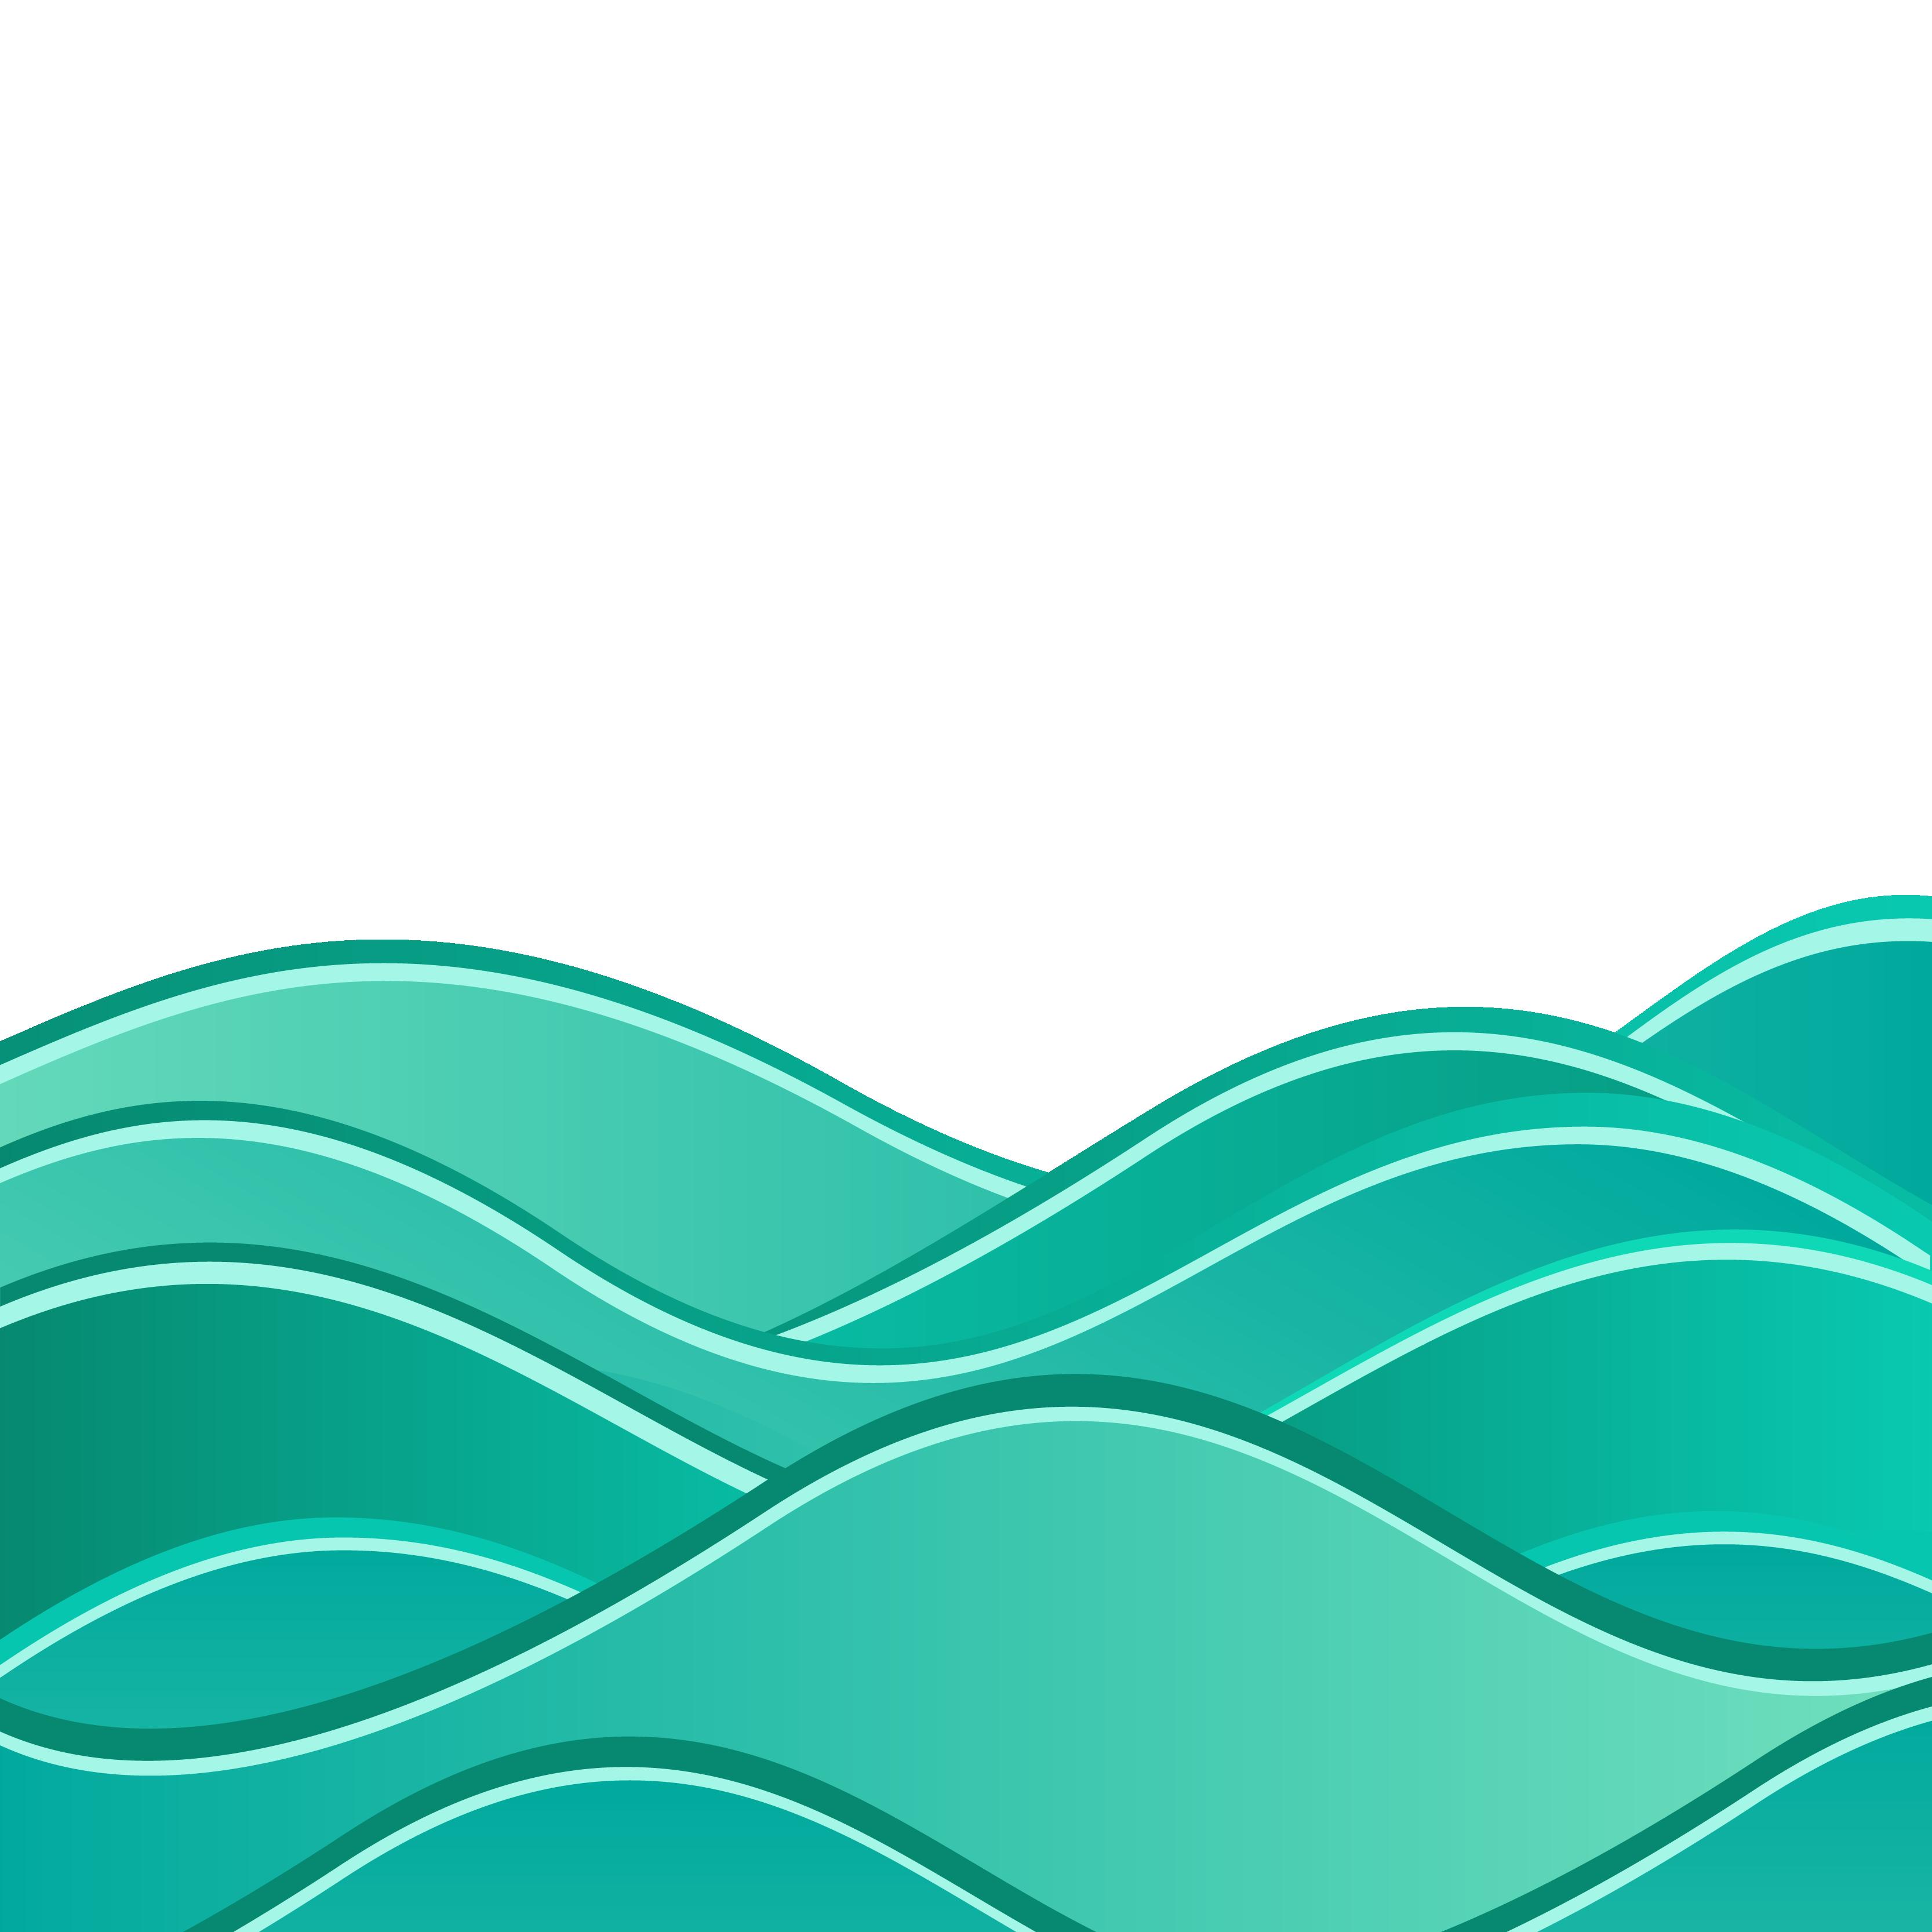 Green Wave Vector Transparent Background